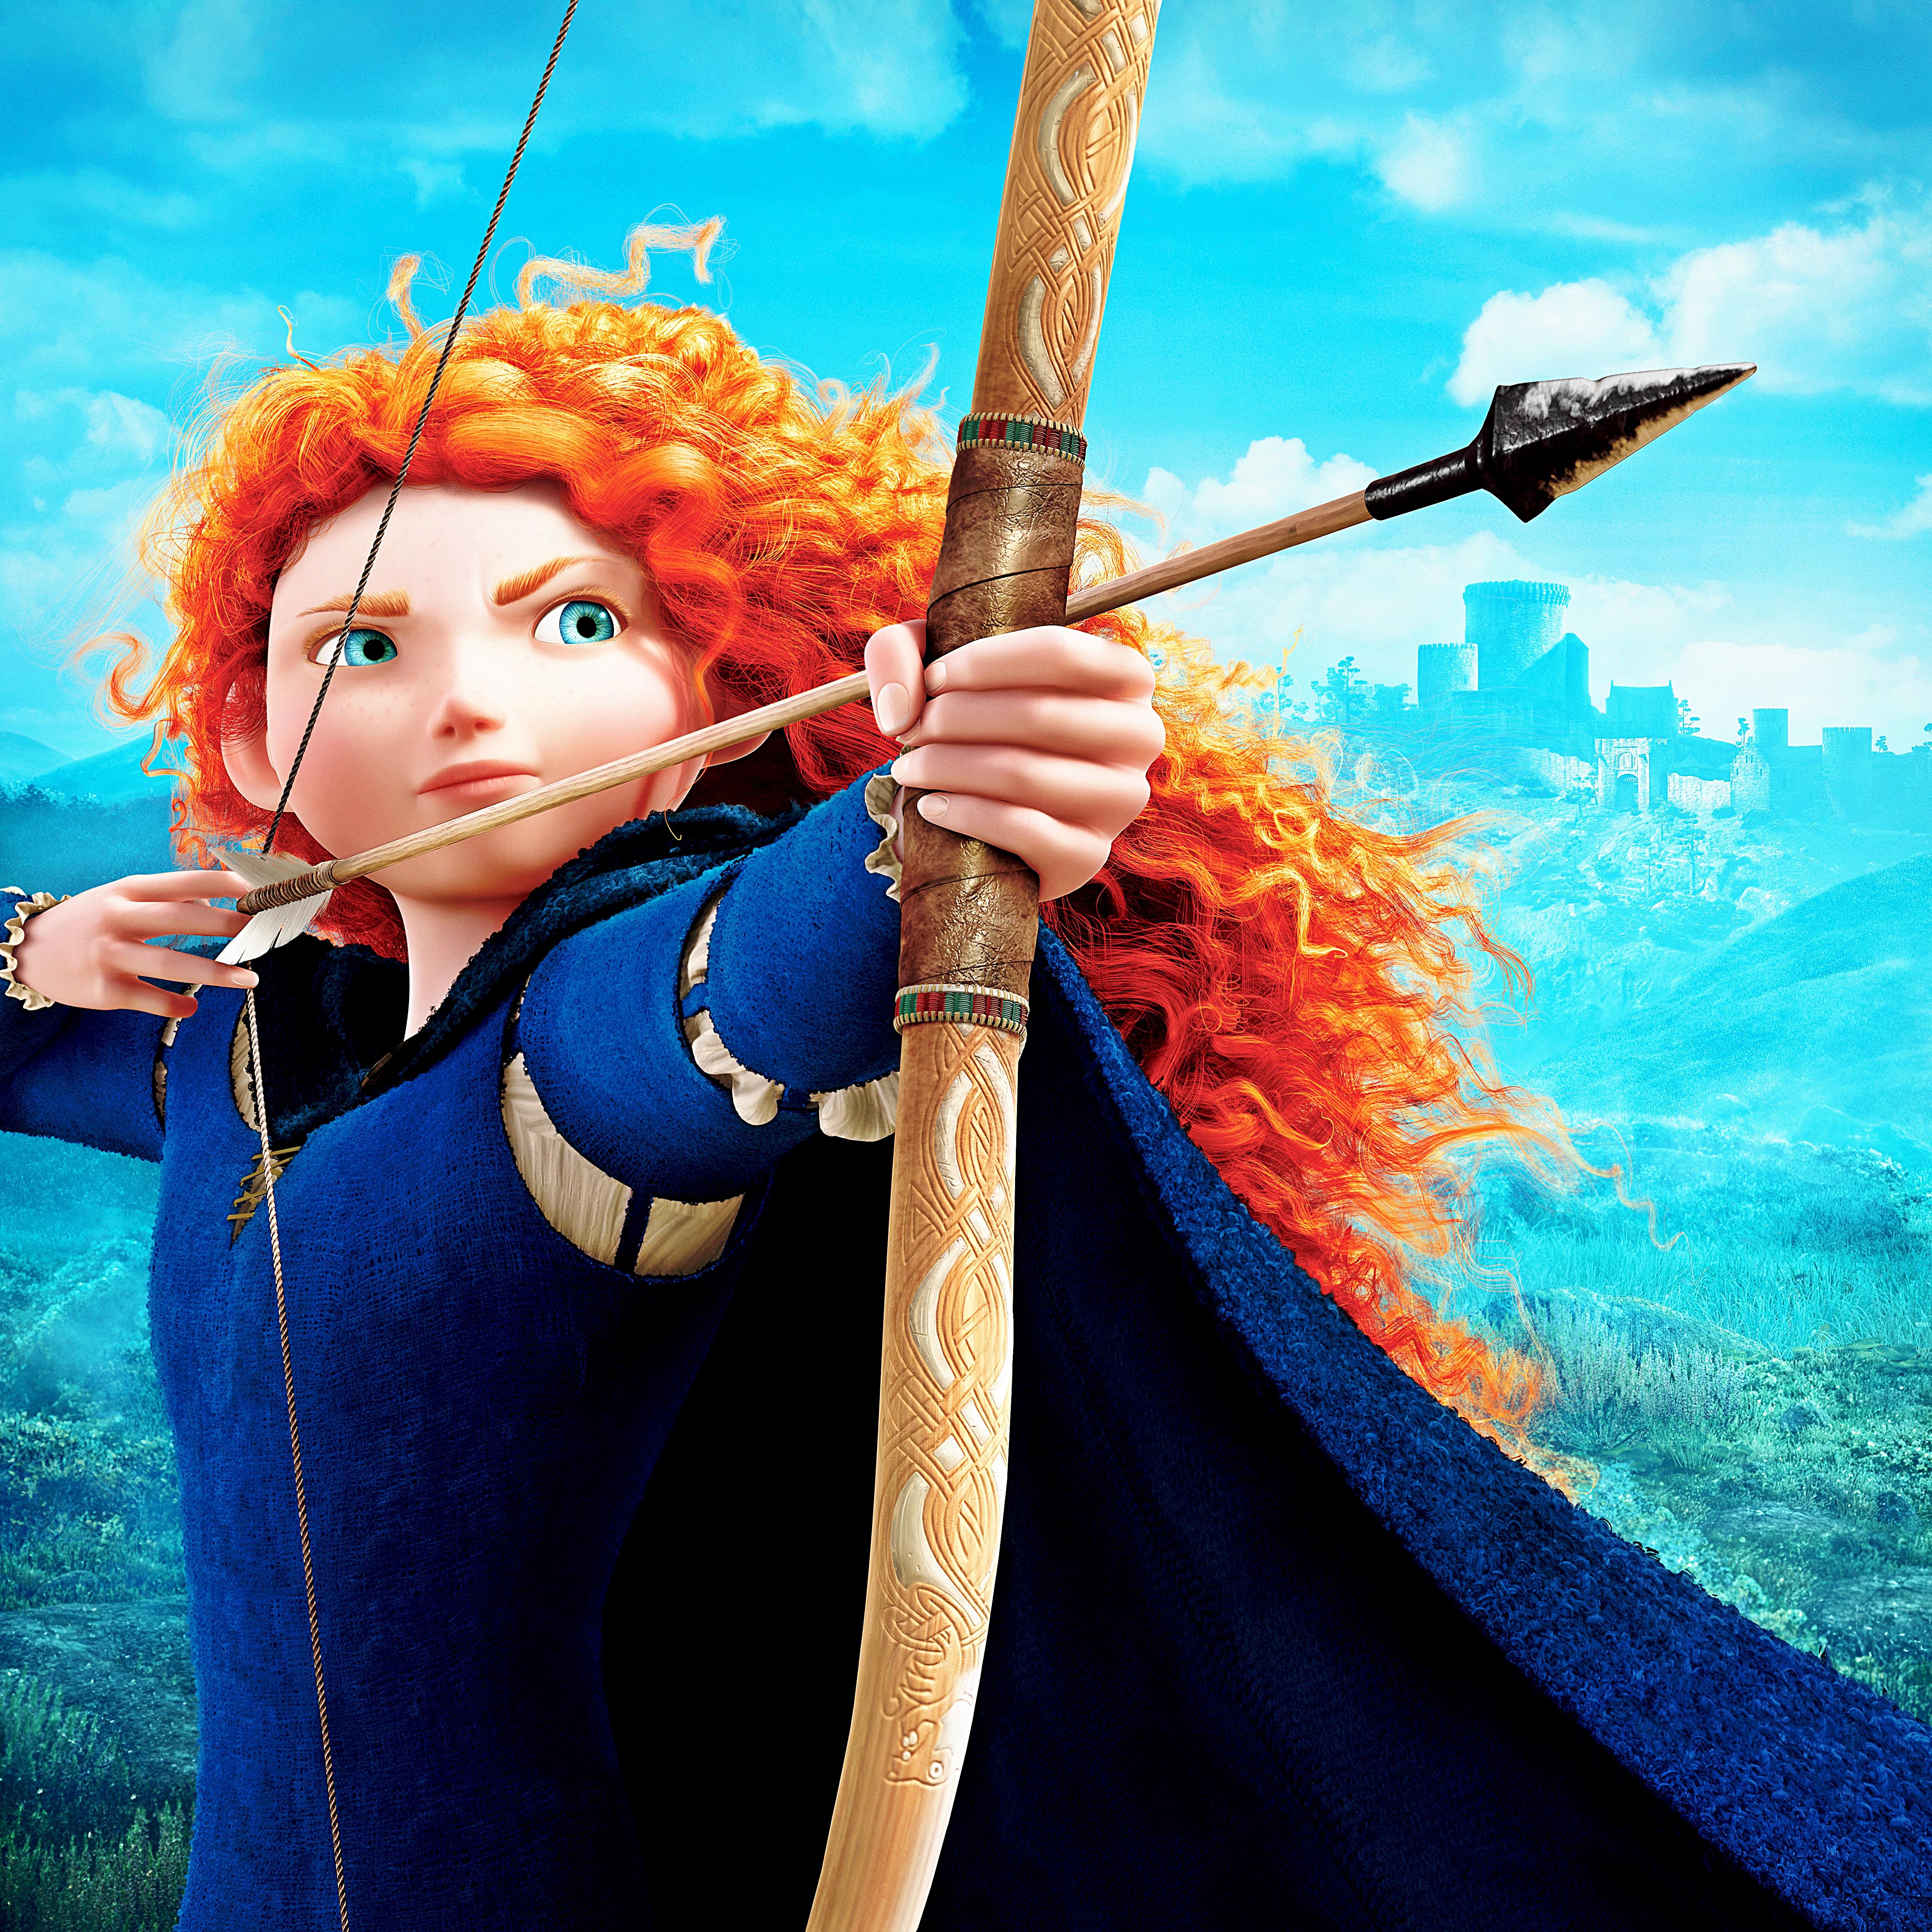 Disney•Pixar Posters - Ribelle - The Brave